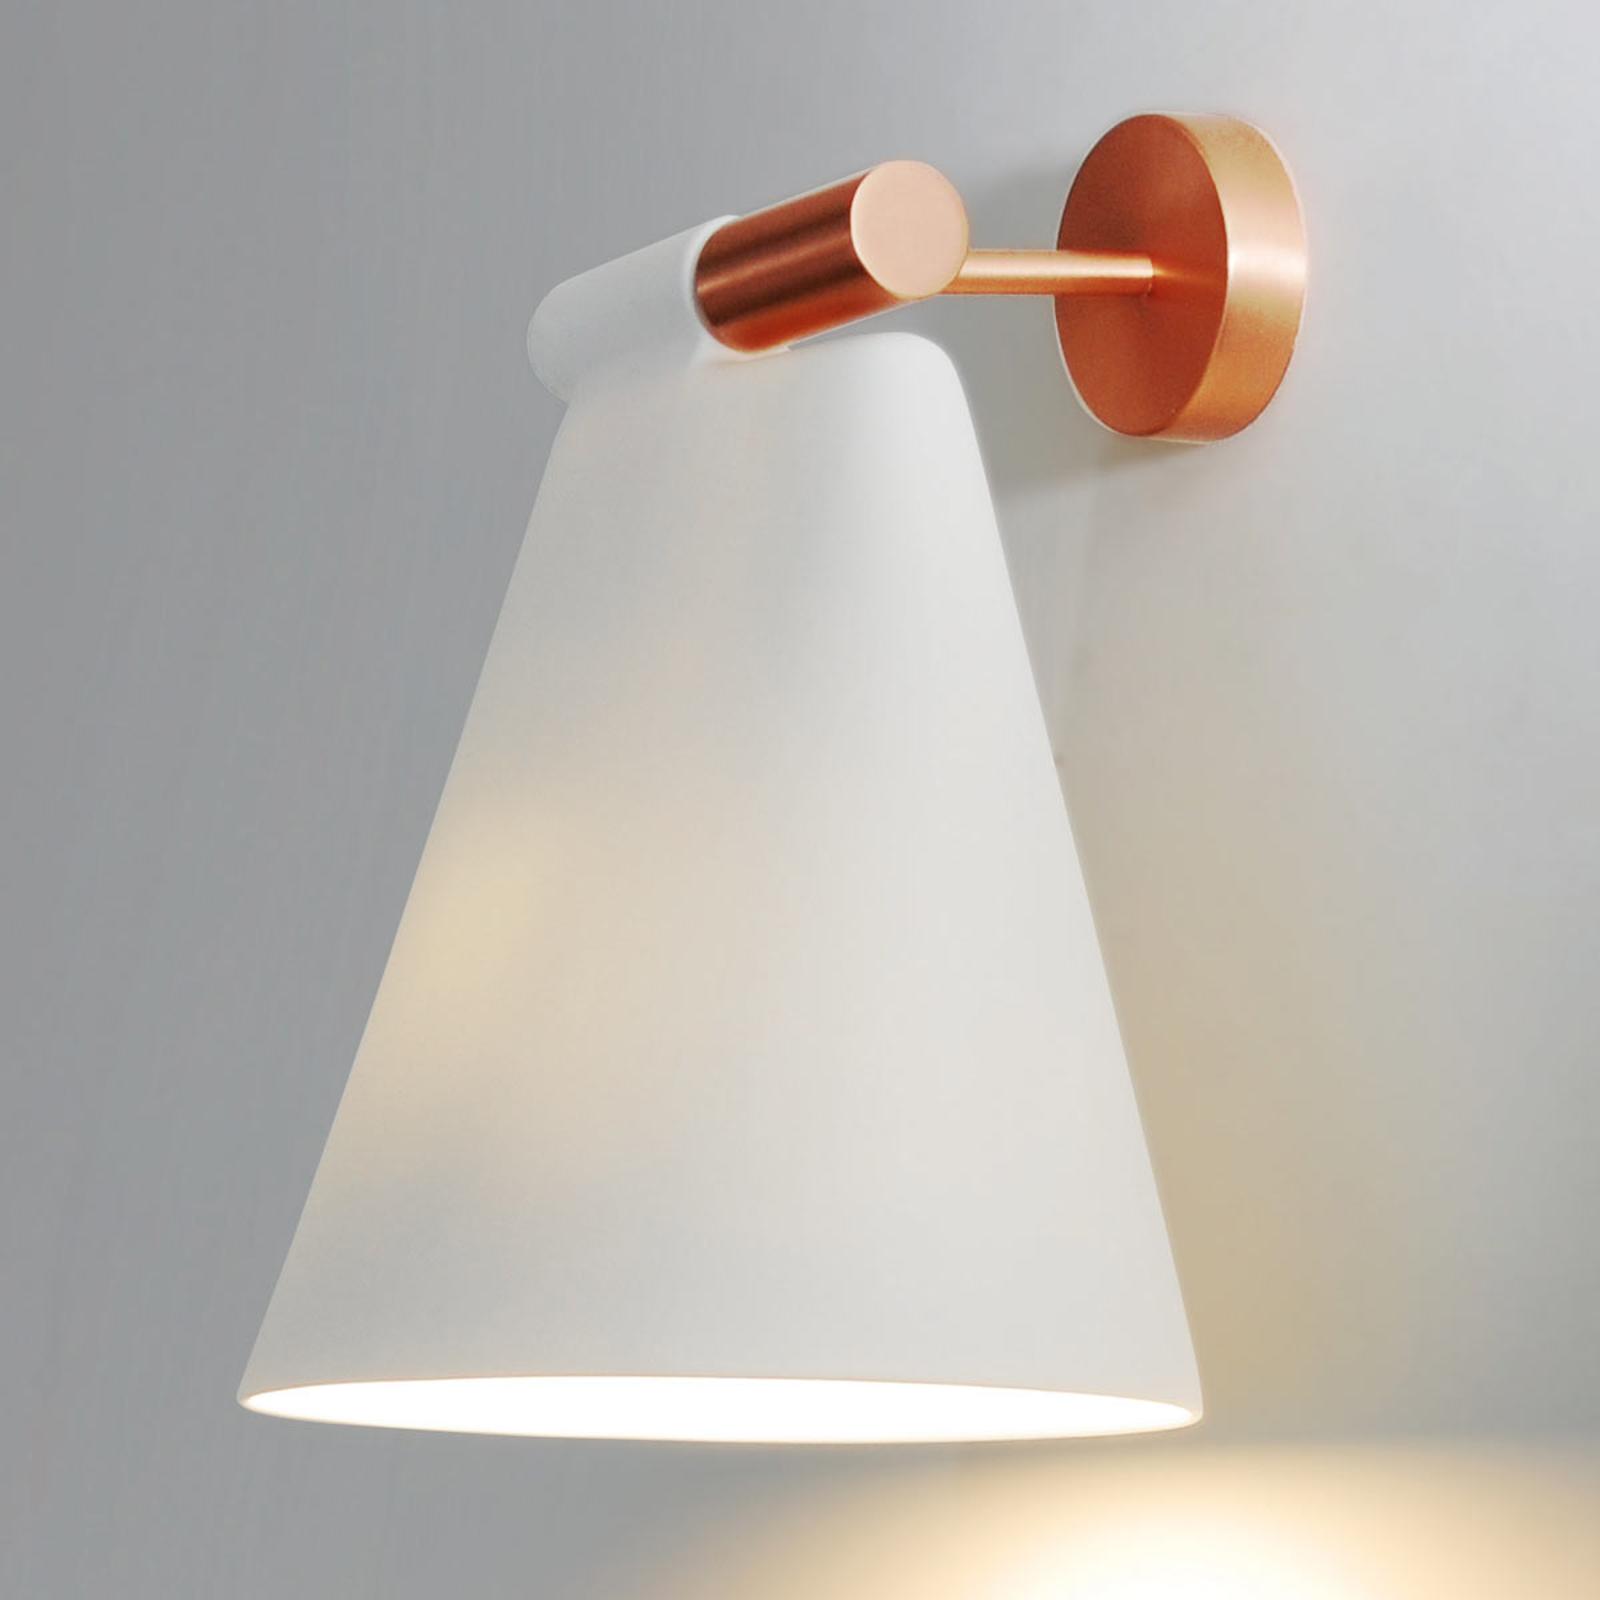 Vegglampe Cone Light W i keramikk